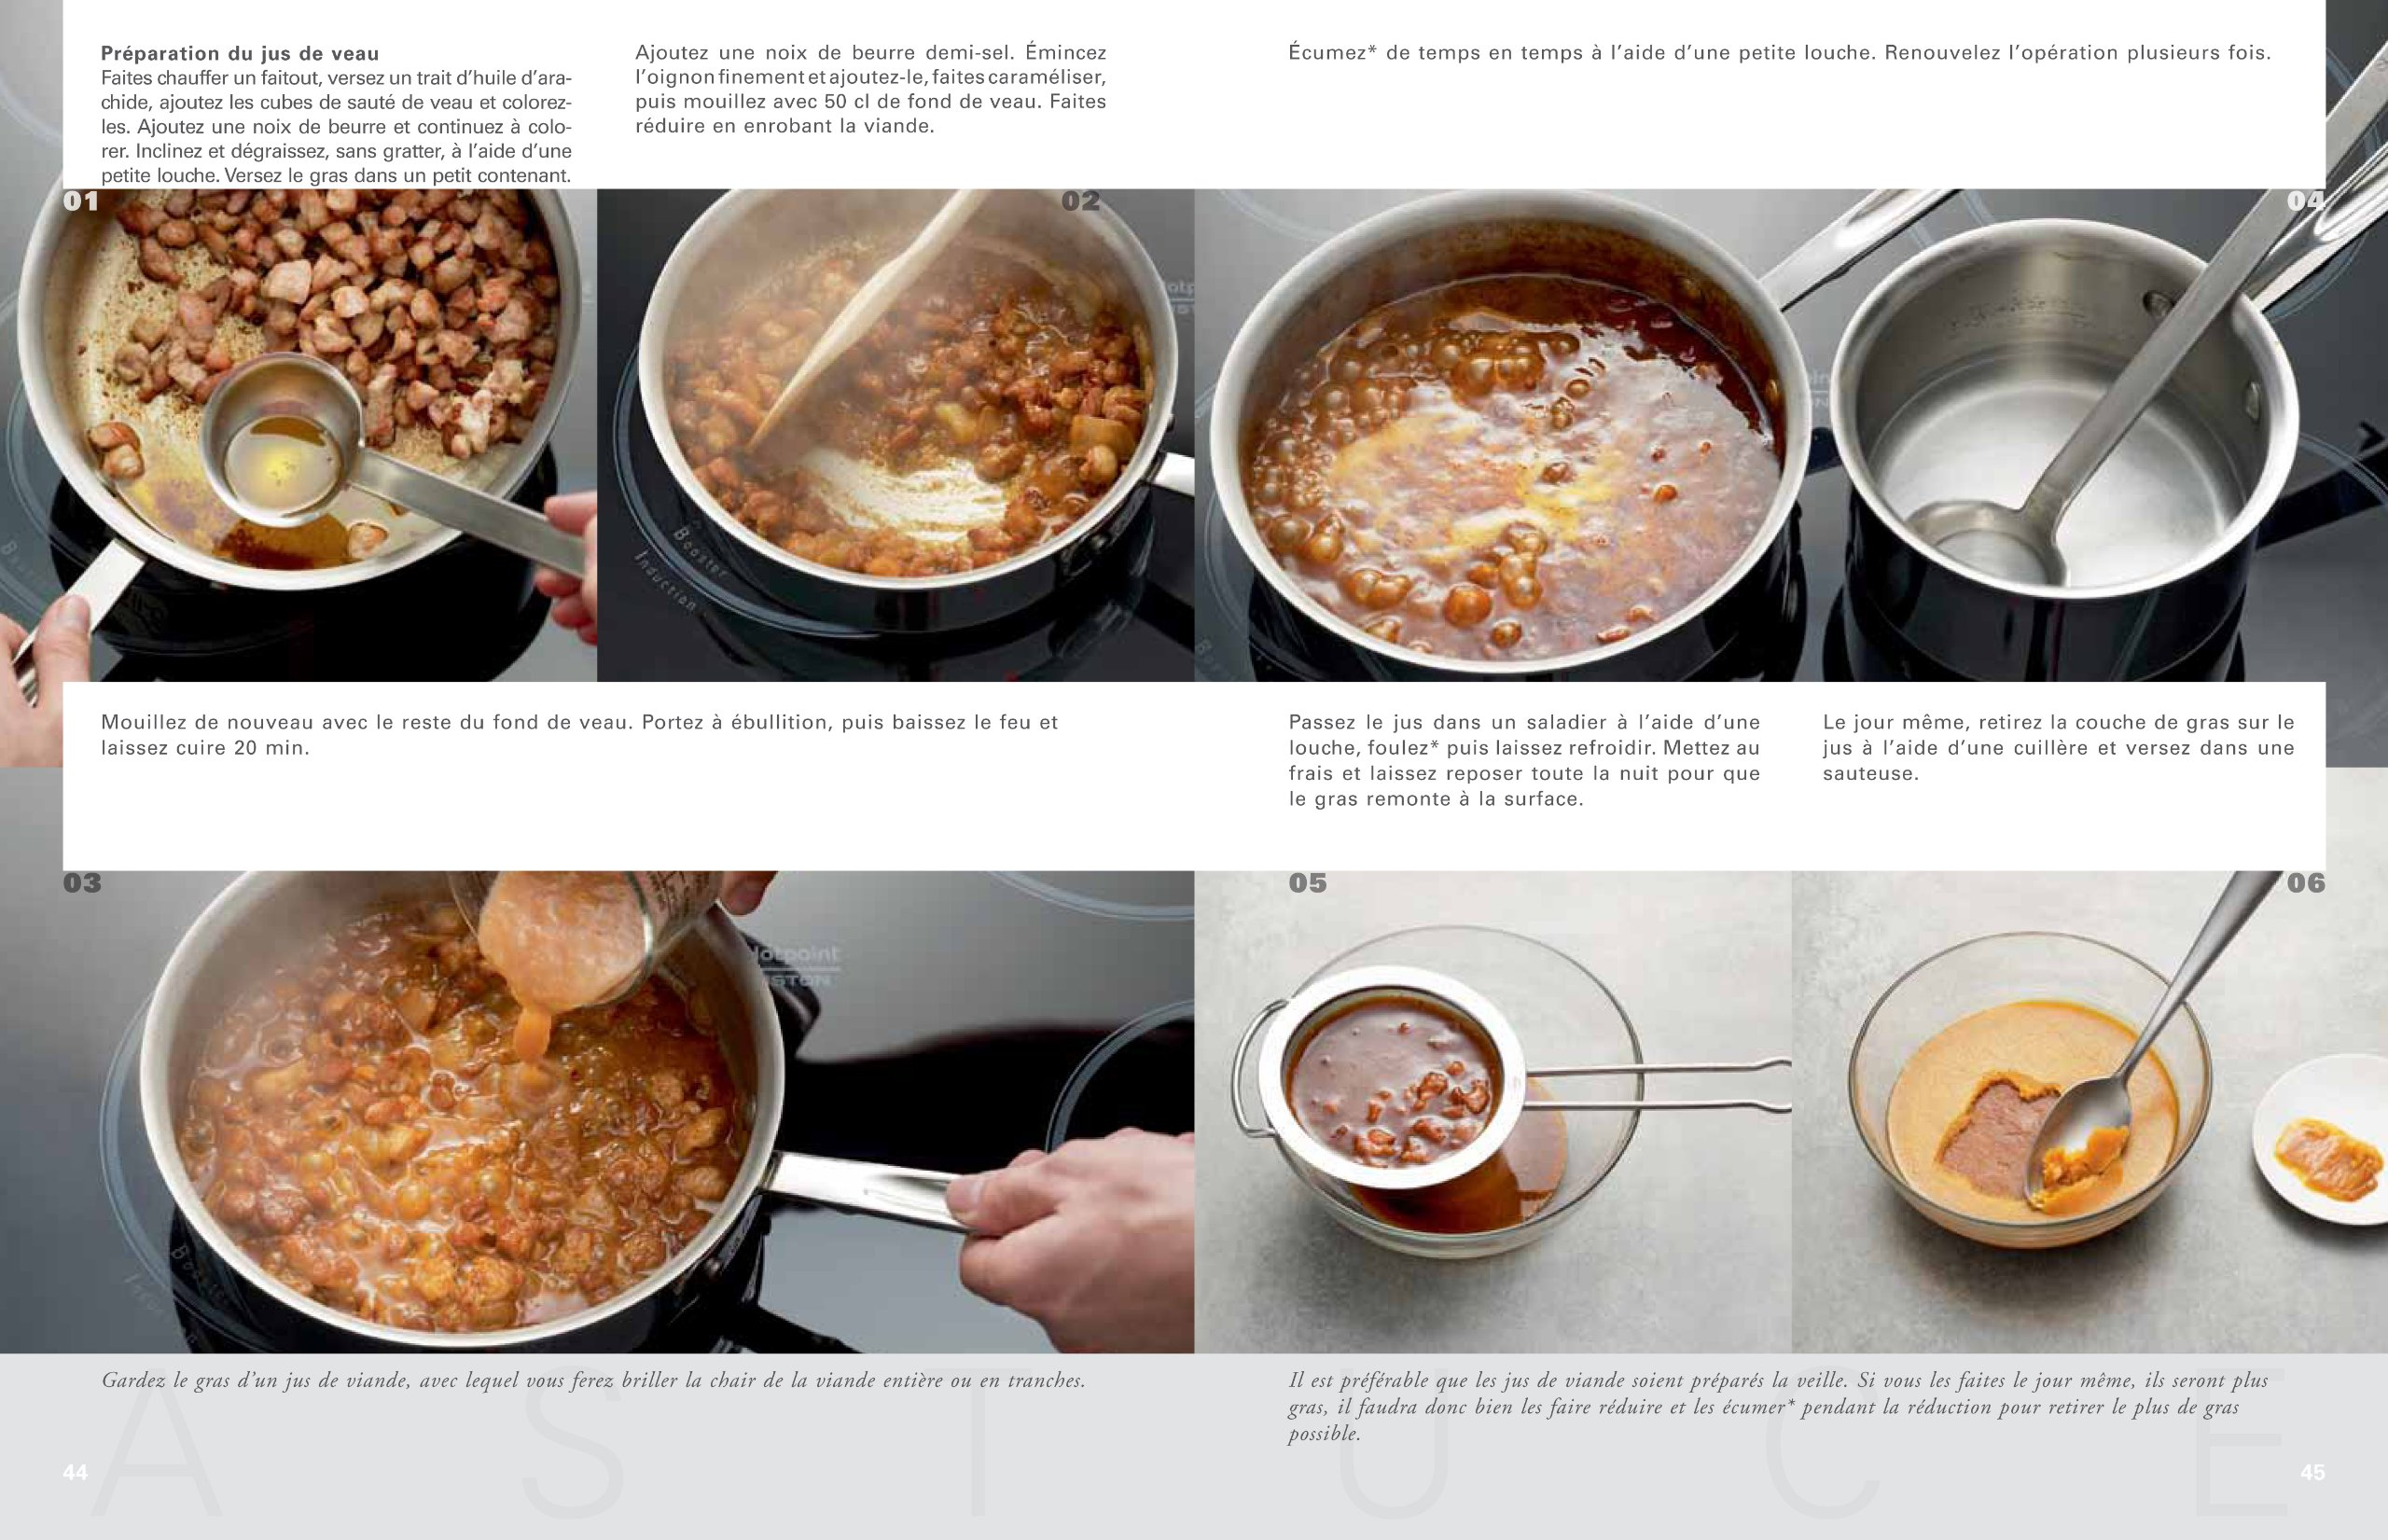 Best Of Cyril Lignac Amazoncom Books - Écumer cuisine